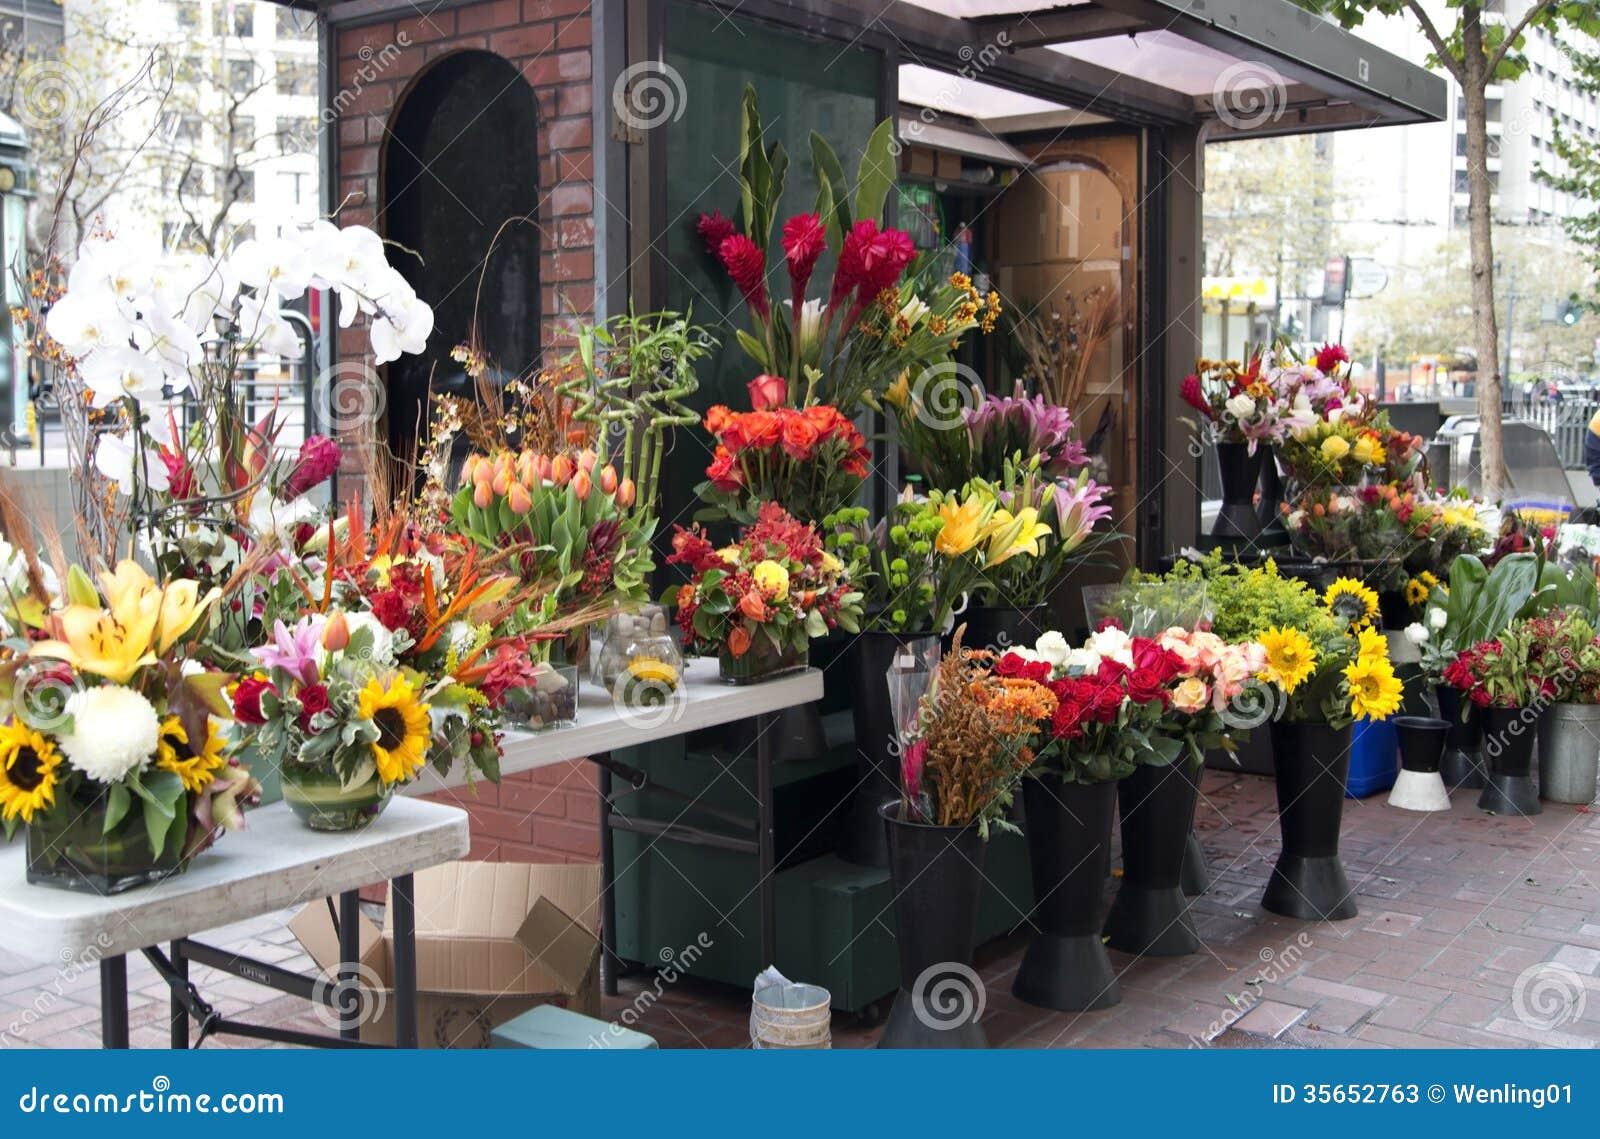 Flower Store On The Roadside Stock Image - Image: 35652763